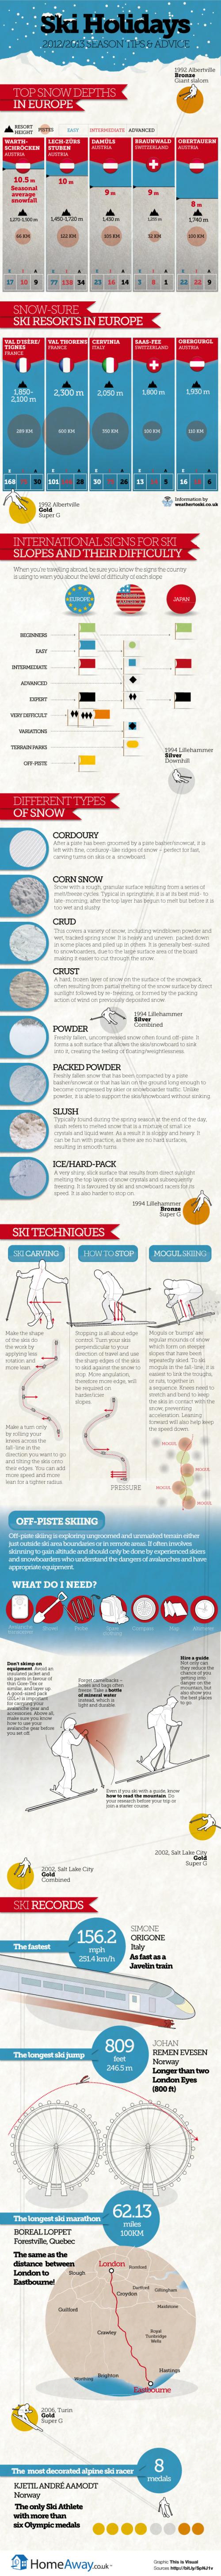 Ski Holidays 2013 infographic